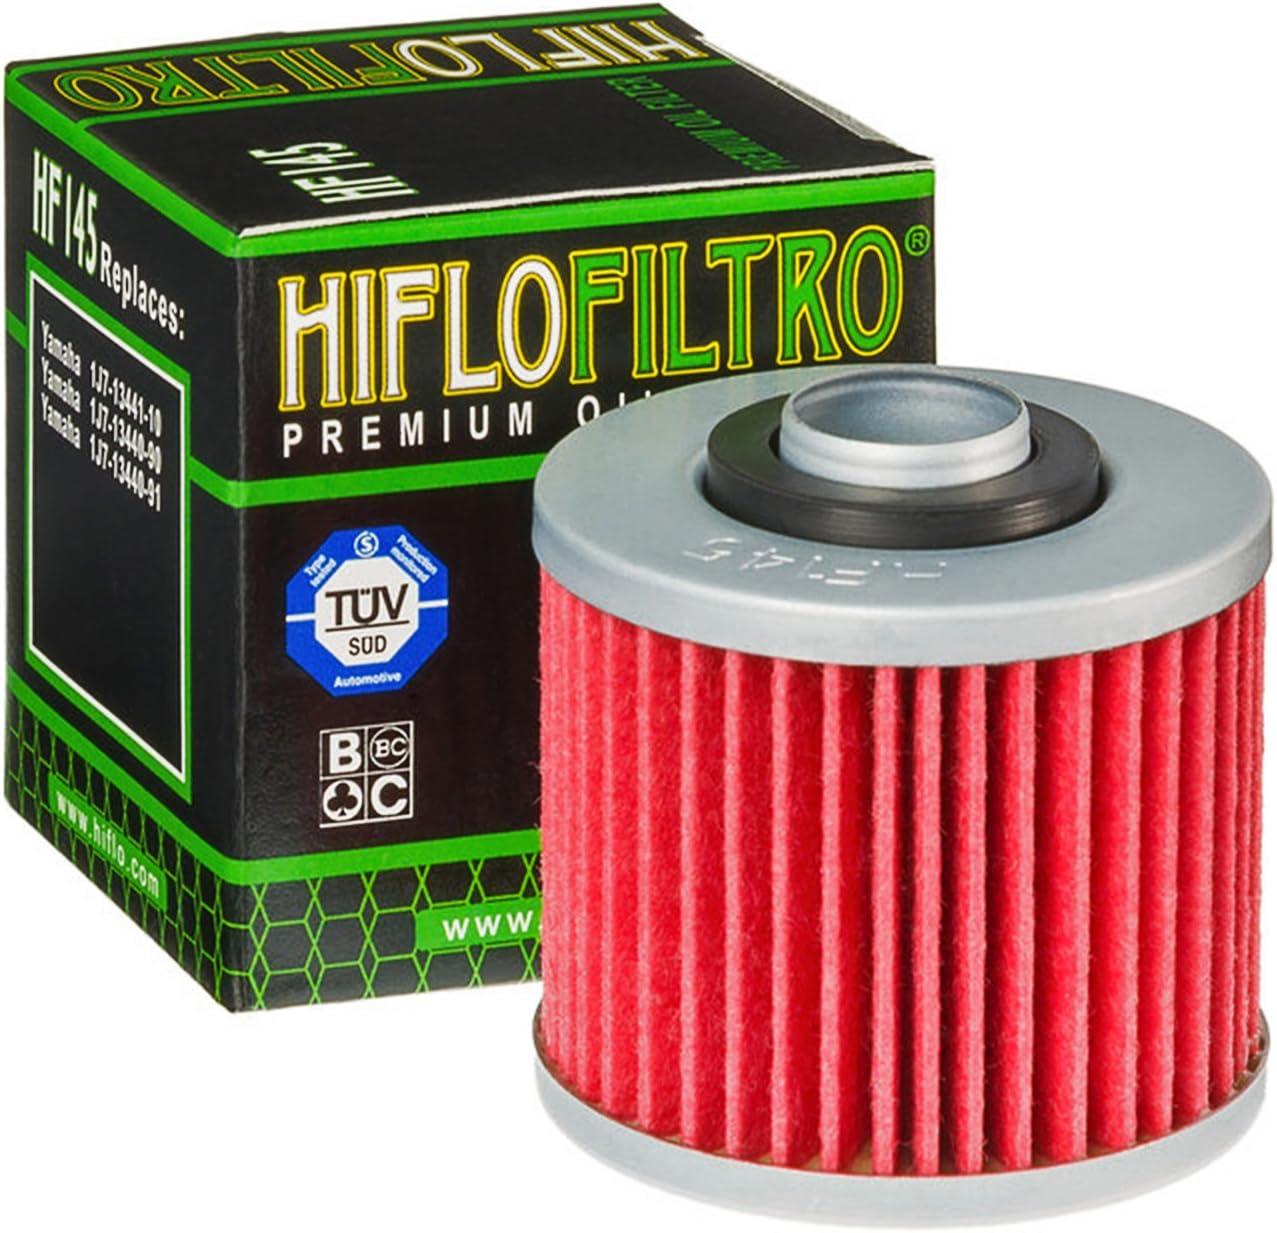 Castrol 10w 40 Öl Hiflo Ölfilter Für Yamaha Xv 125 Virago S 97 01 5aj Ölwechselset Inkl Motoröl Filter Dichtring Auto